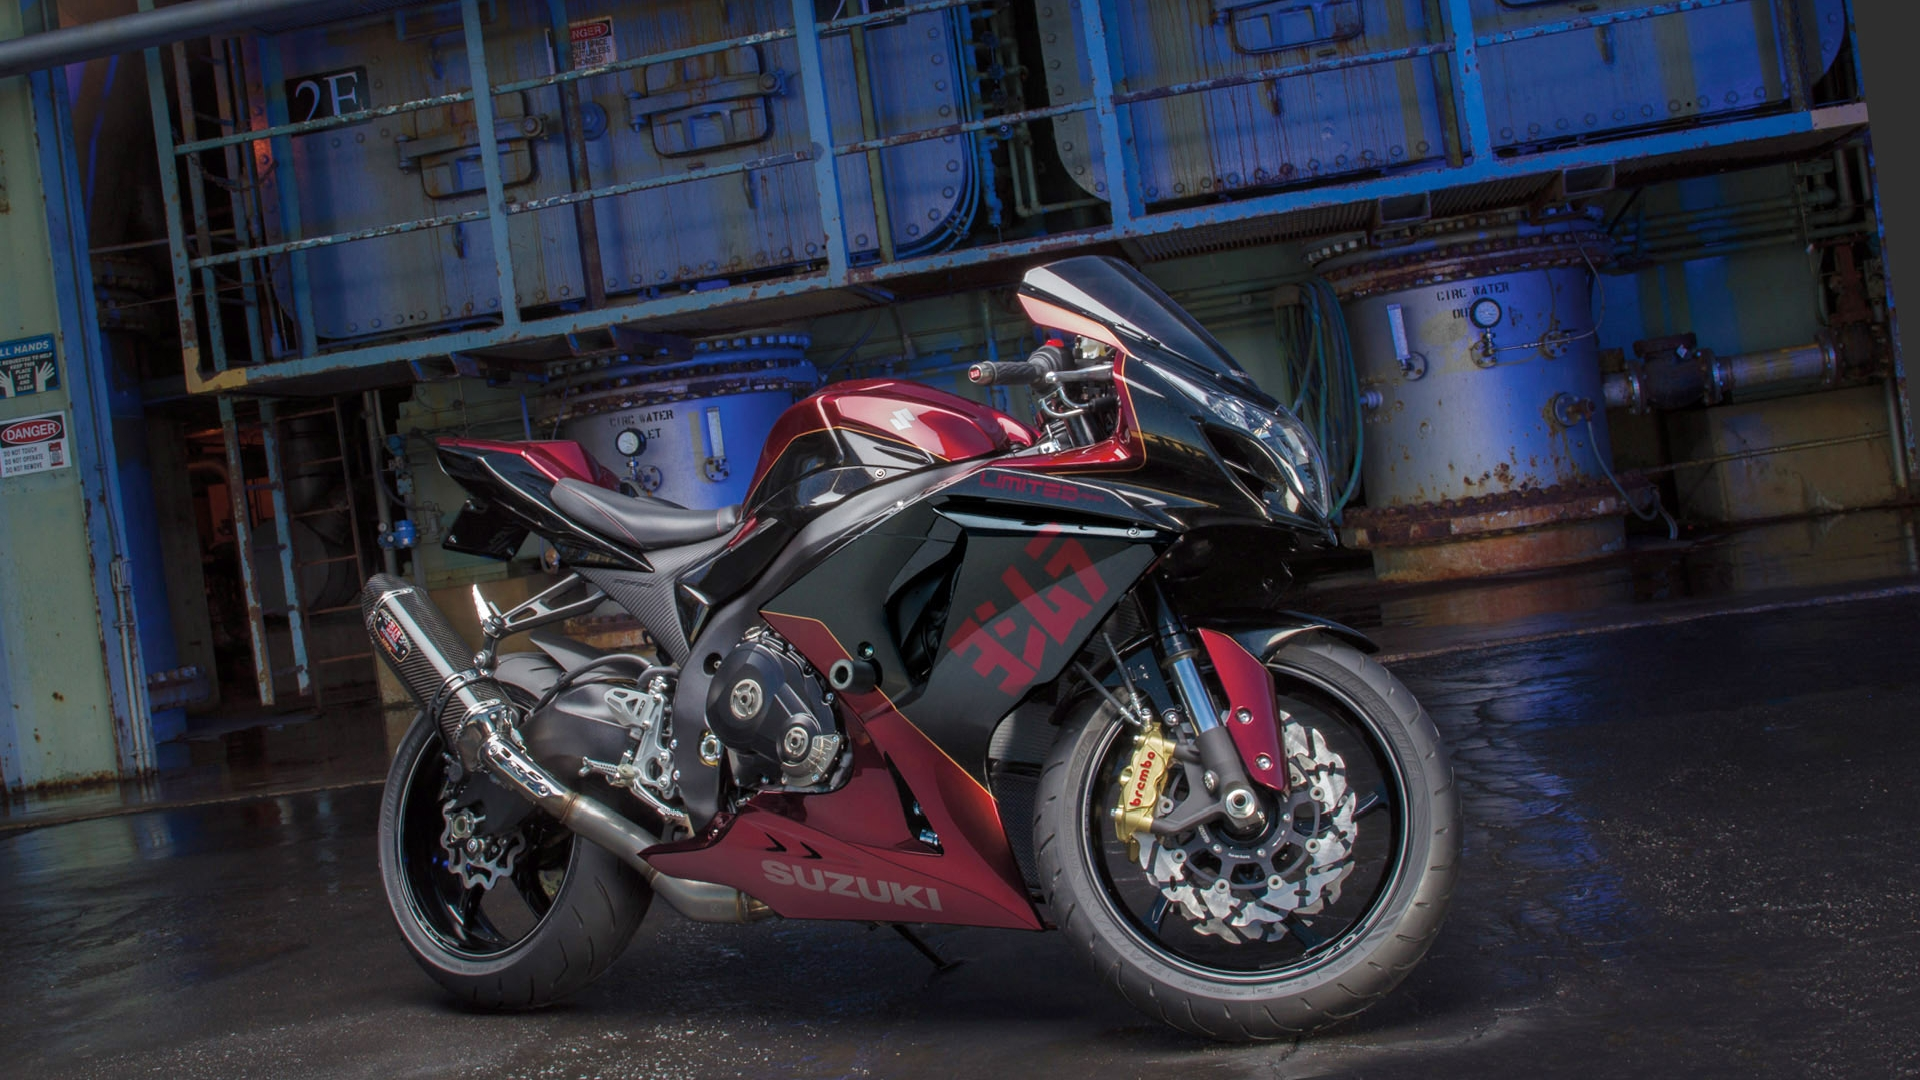 2013 Yoshimura Limited Edition Suzuki GSX-R [Video